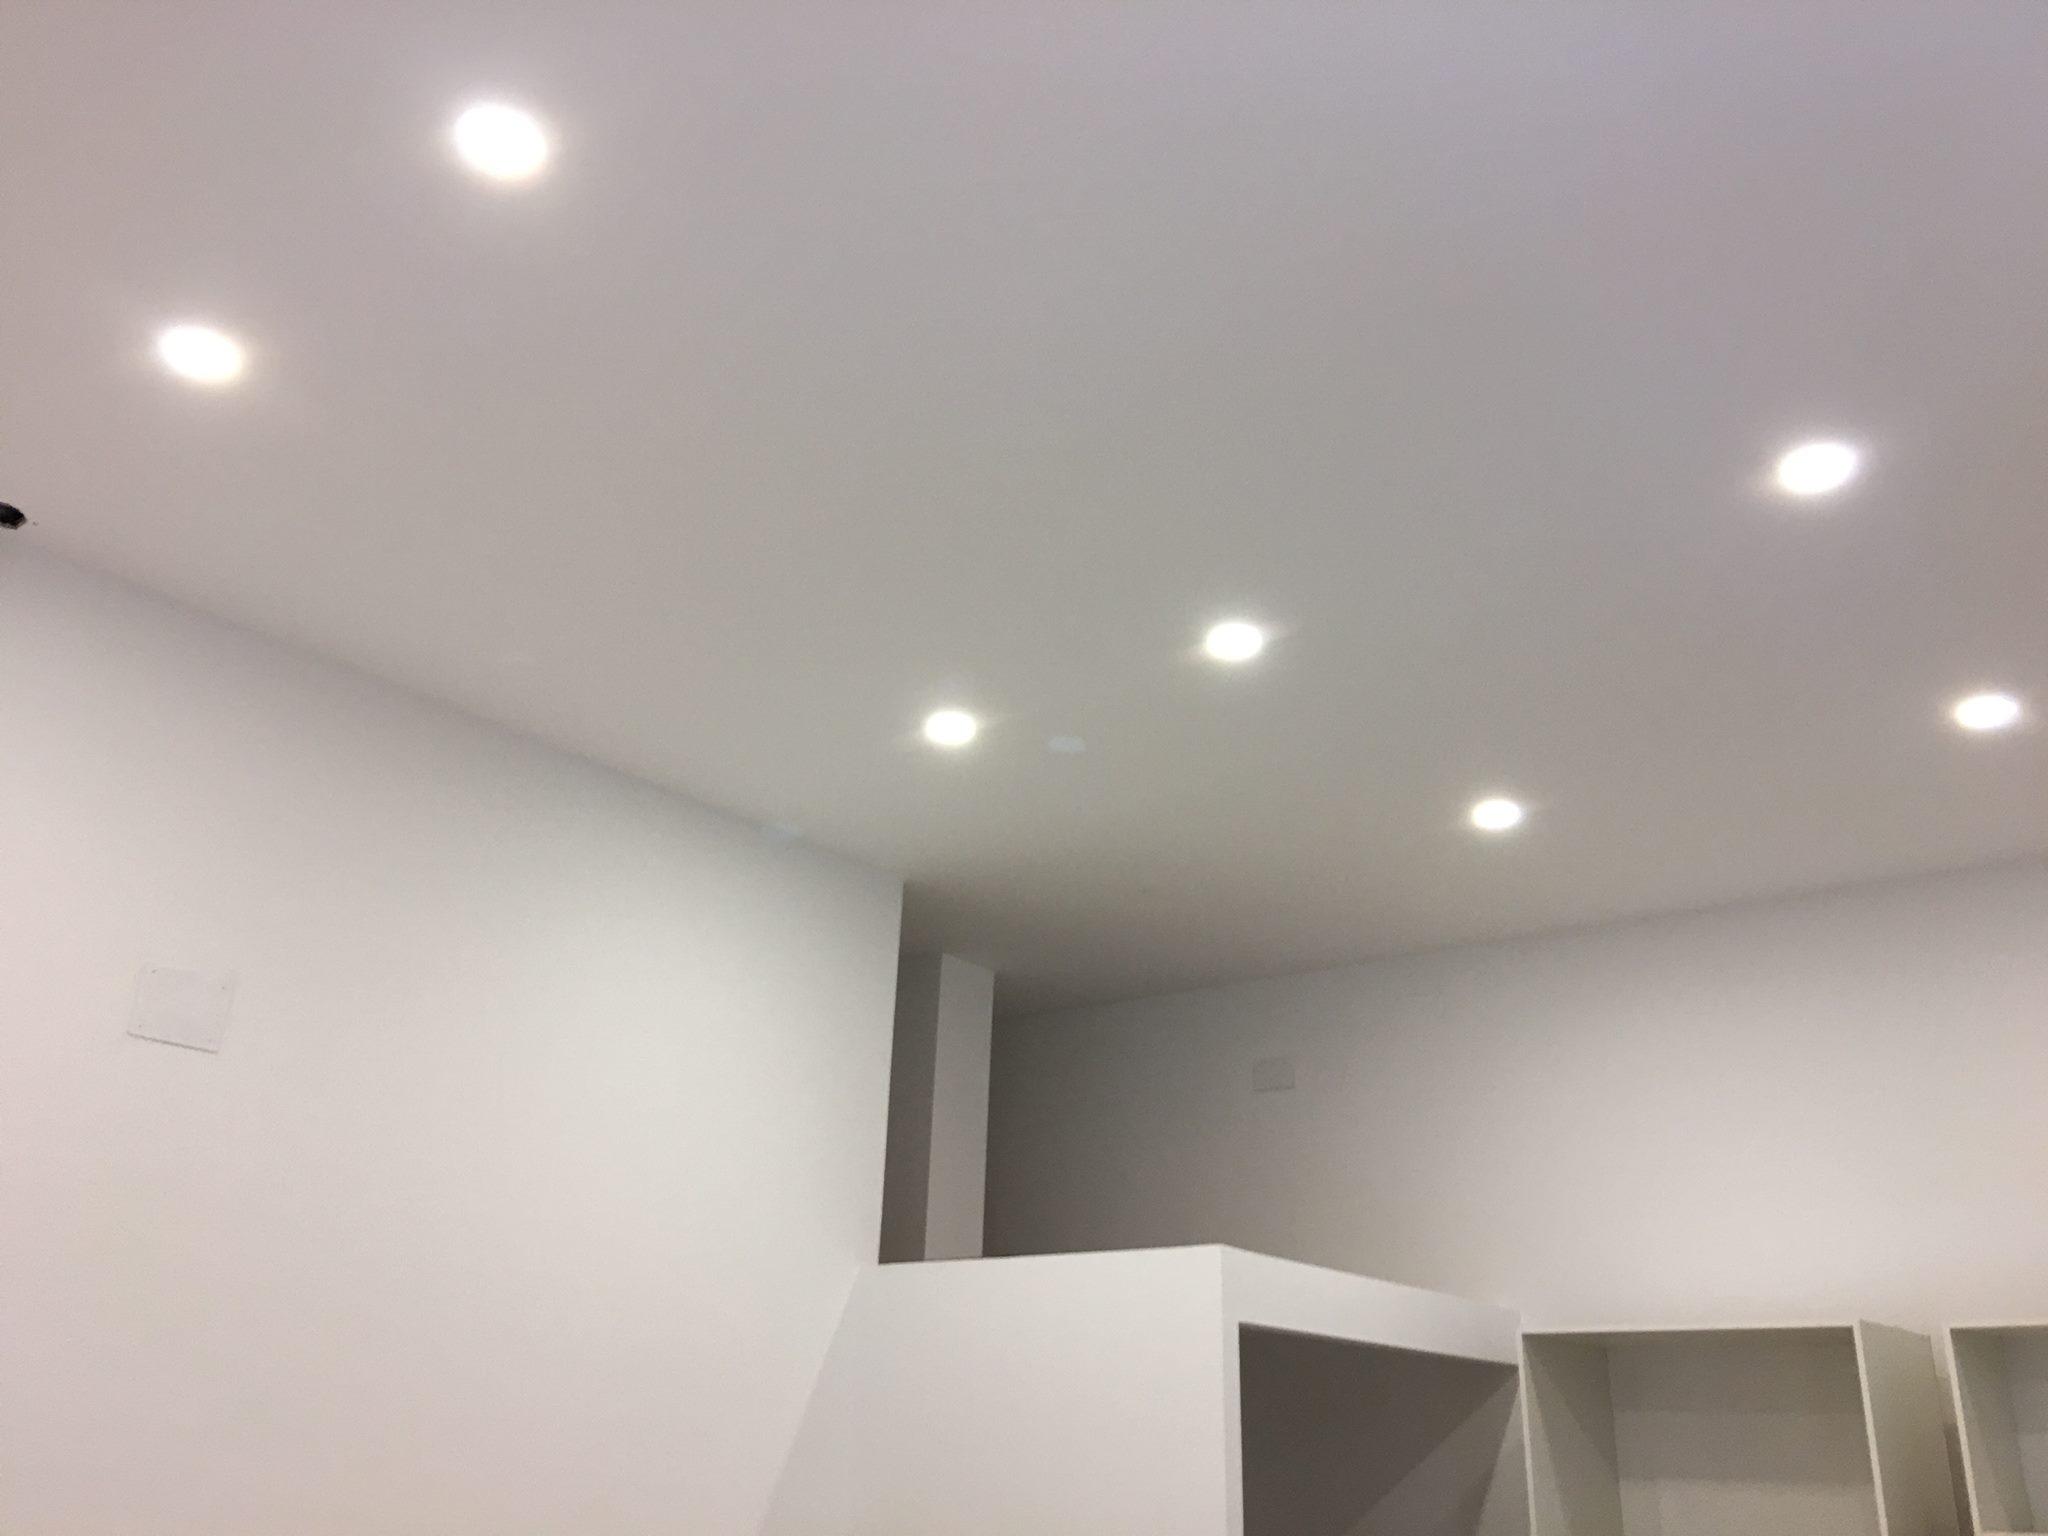 http://www.metelcor.es/wp-content/uploads/2016/04/metelcor-instalacion-electrica-loft-calle-betis-2.jpg